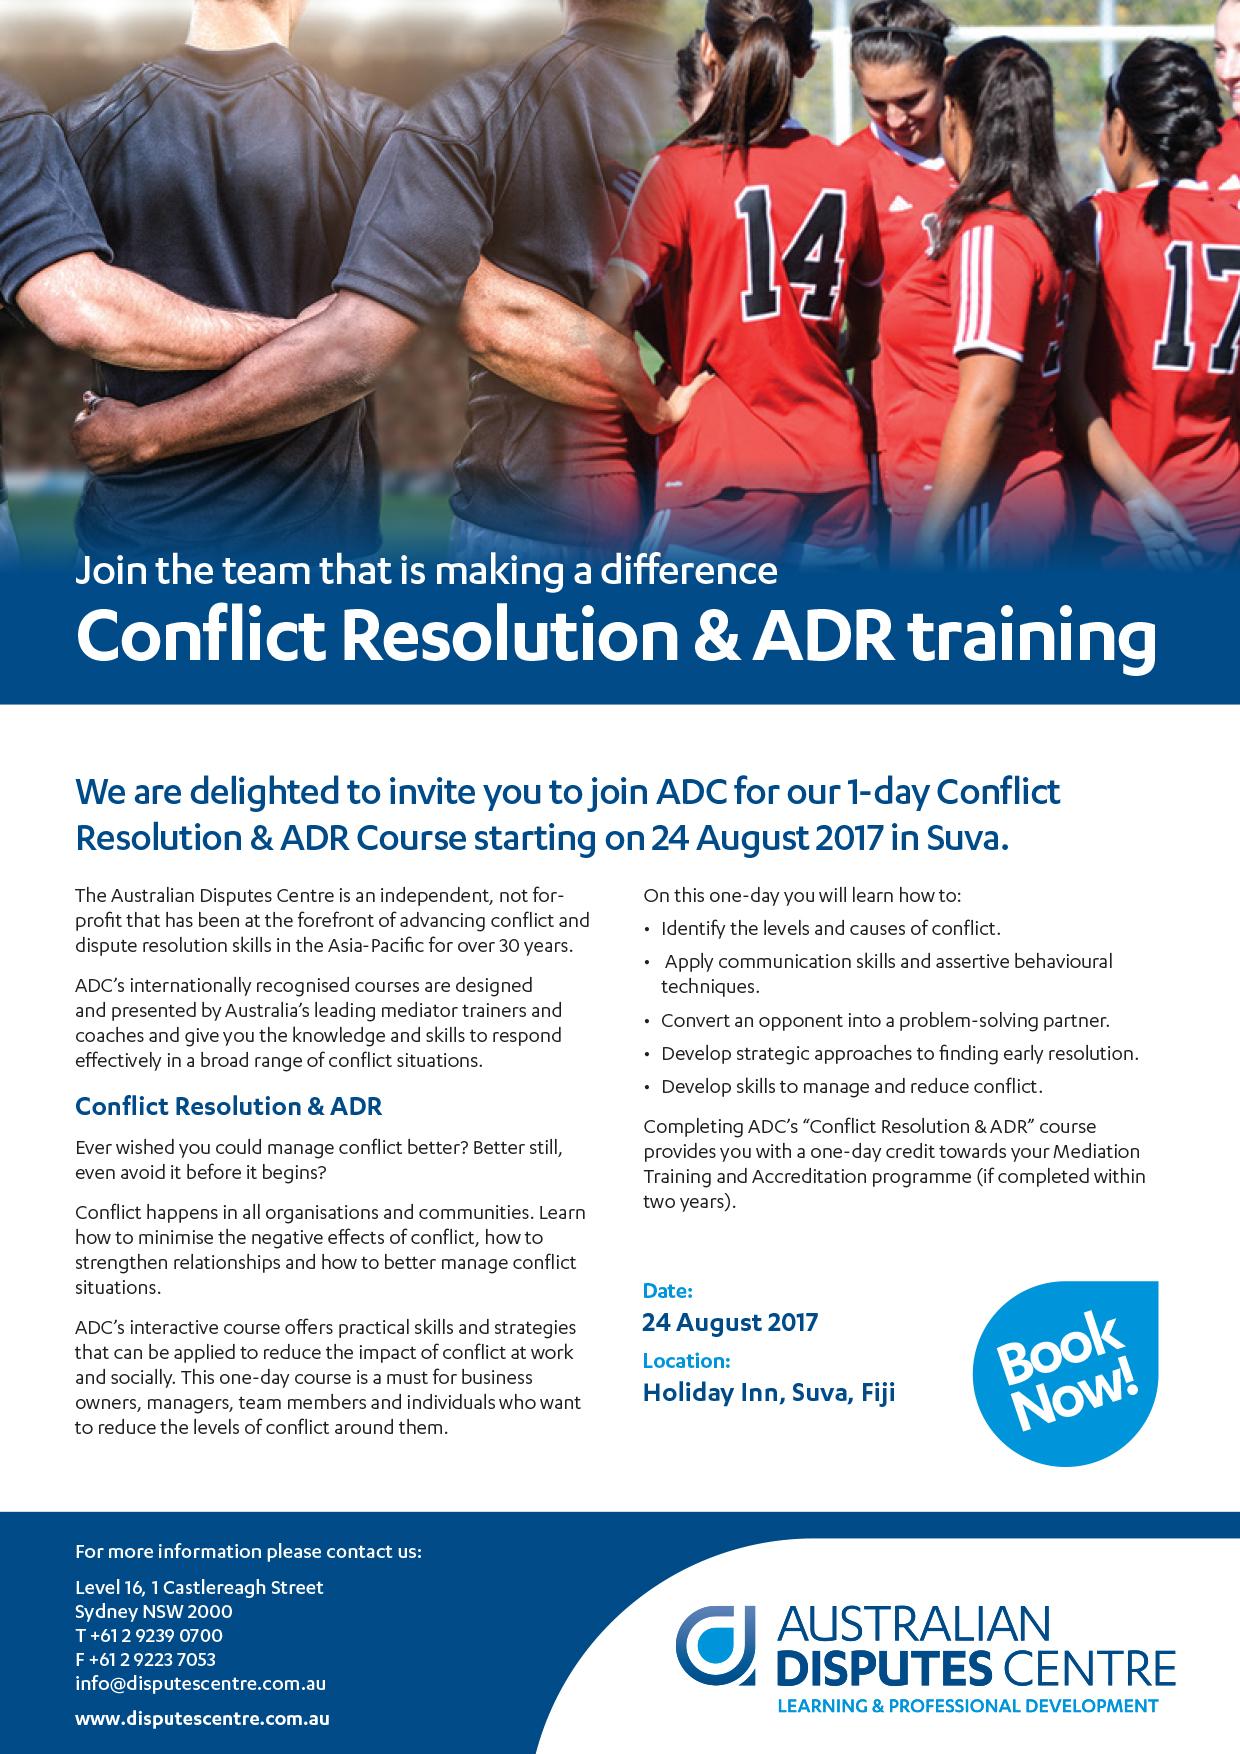 Conflict Resolution & ADR - Suva Fiji | Australian Disputes Centre